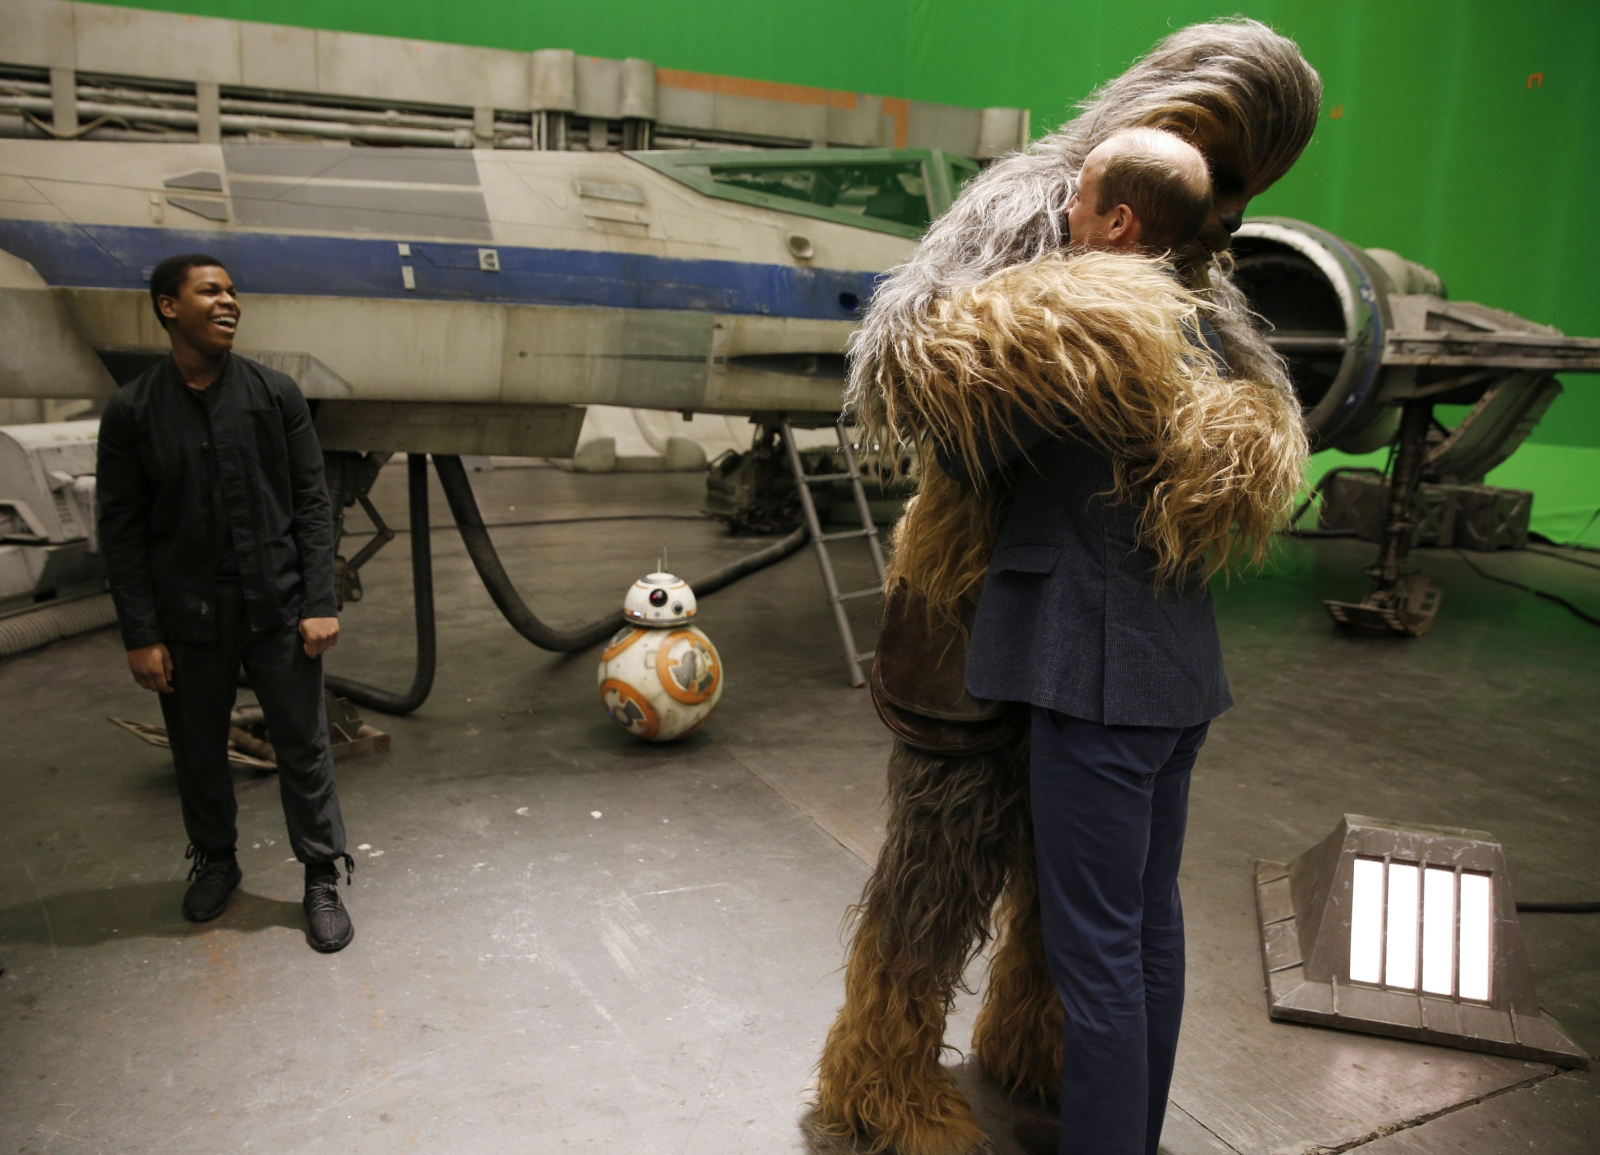 Chewbacca hugs Prince William